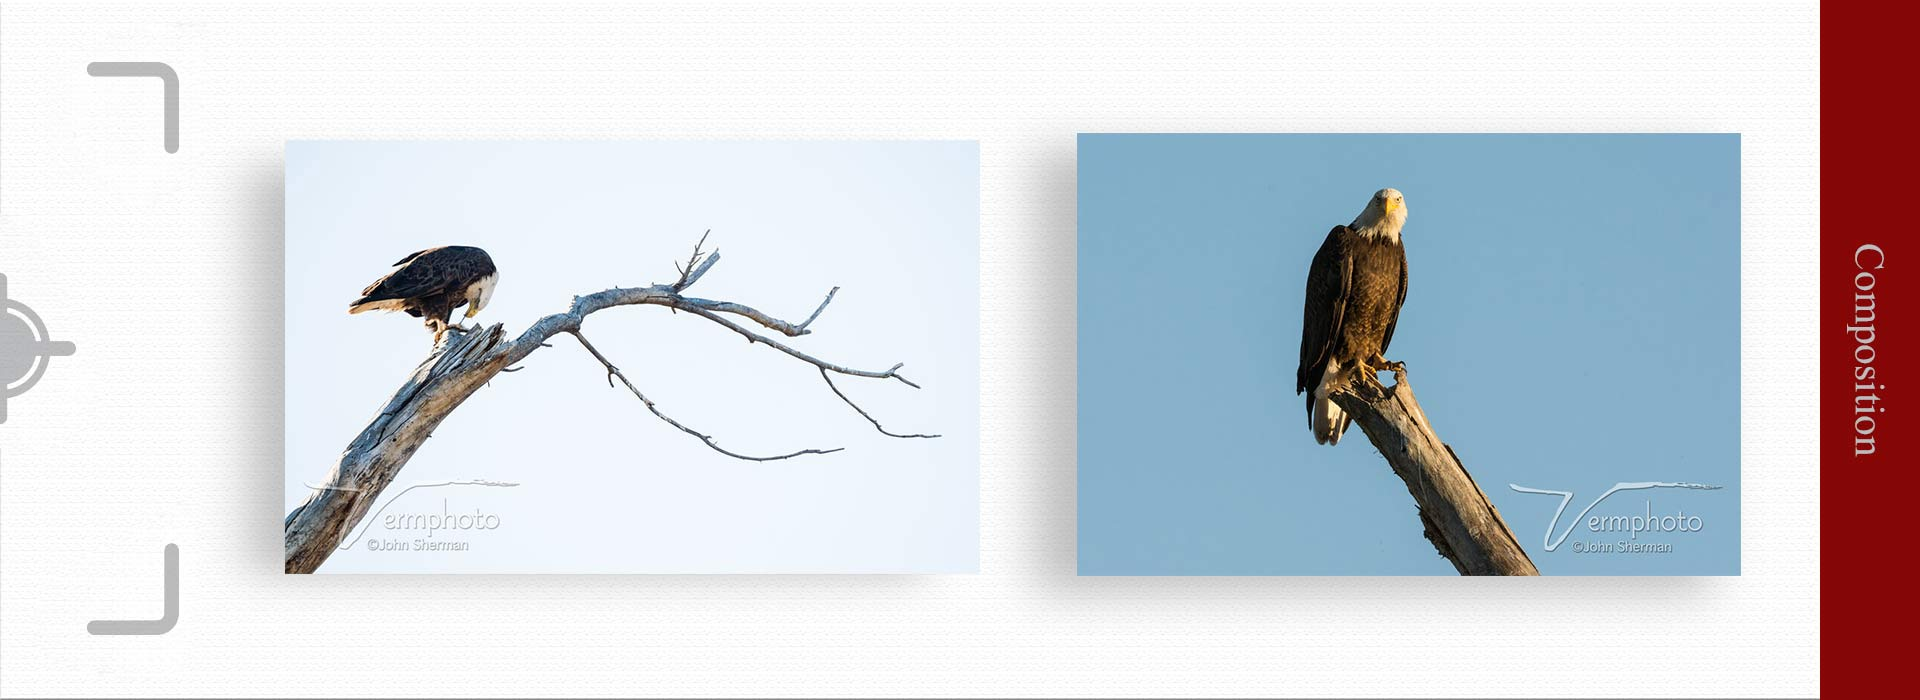 Composition in photography 2 - مهمترین ویژگی های عکس خوب چیست ؟